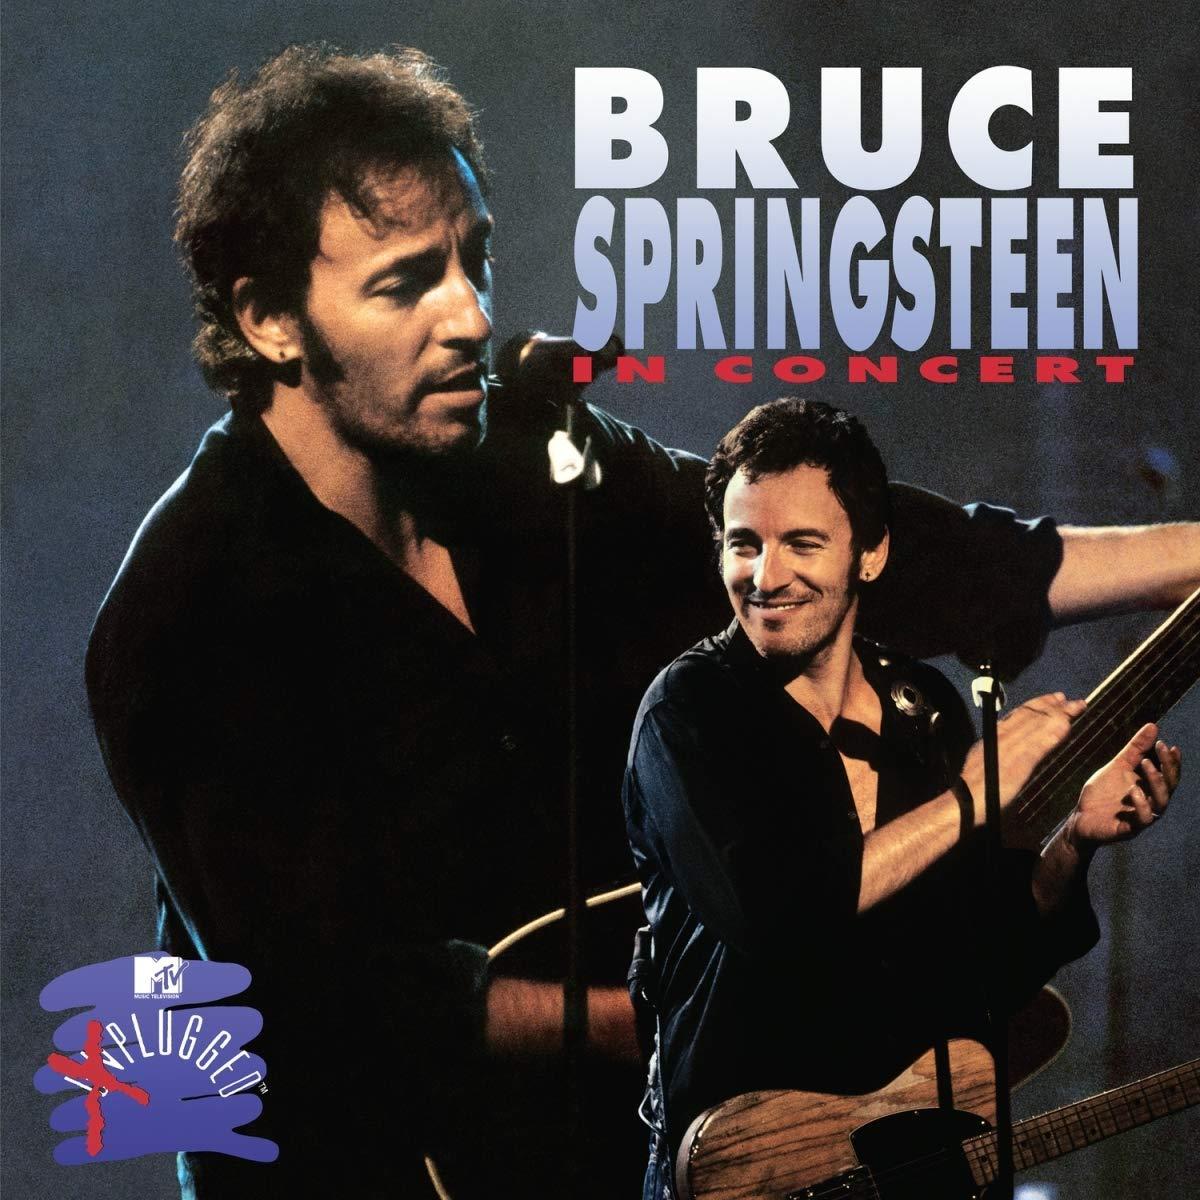 Брюс Спрингстин Bruce Springsteen. In Concert - Mtv Plugged (2 LP) bruce springsteen bruce springsteen mtv plugged 2 lp